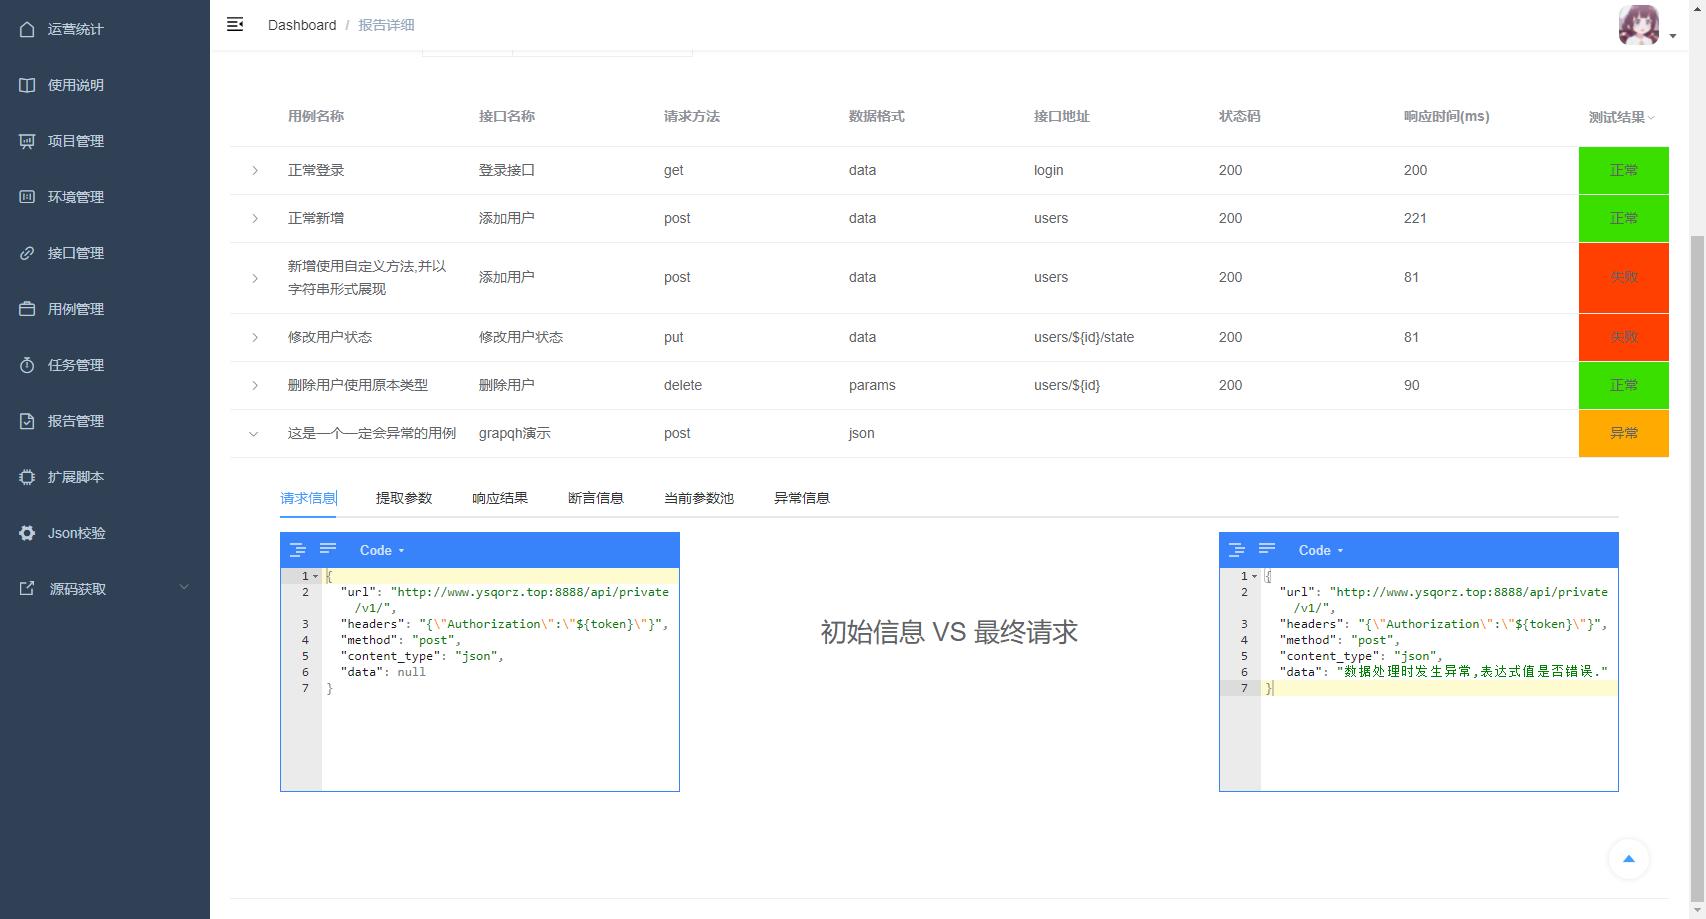 FastAPI + Vue 前后端分离 接口自动化测试工具 apiAutoTestWeb